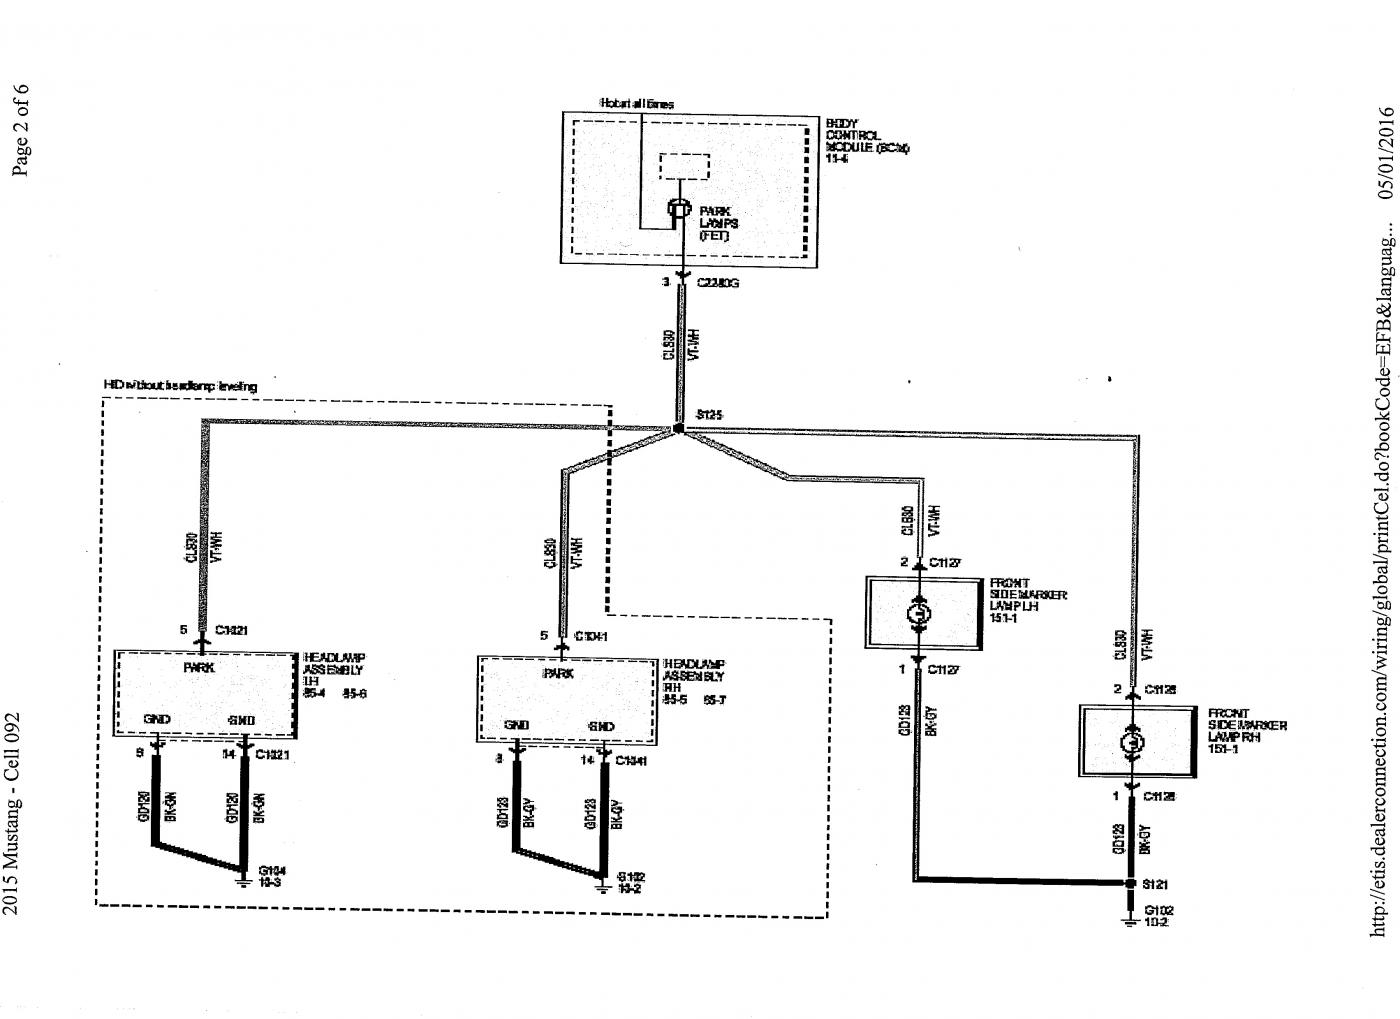 [DIAGRAM] 1965 Mustang Wiring Diagrams Wiring Diagram FULL